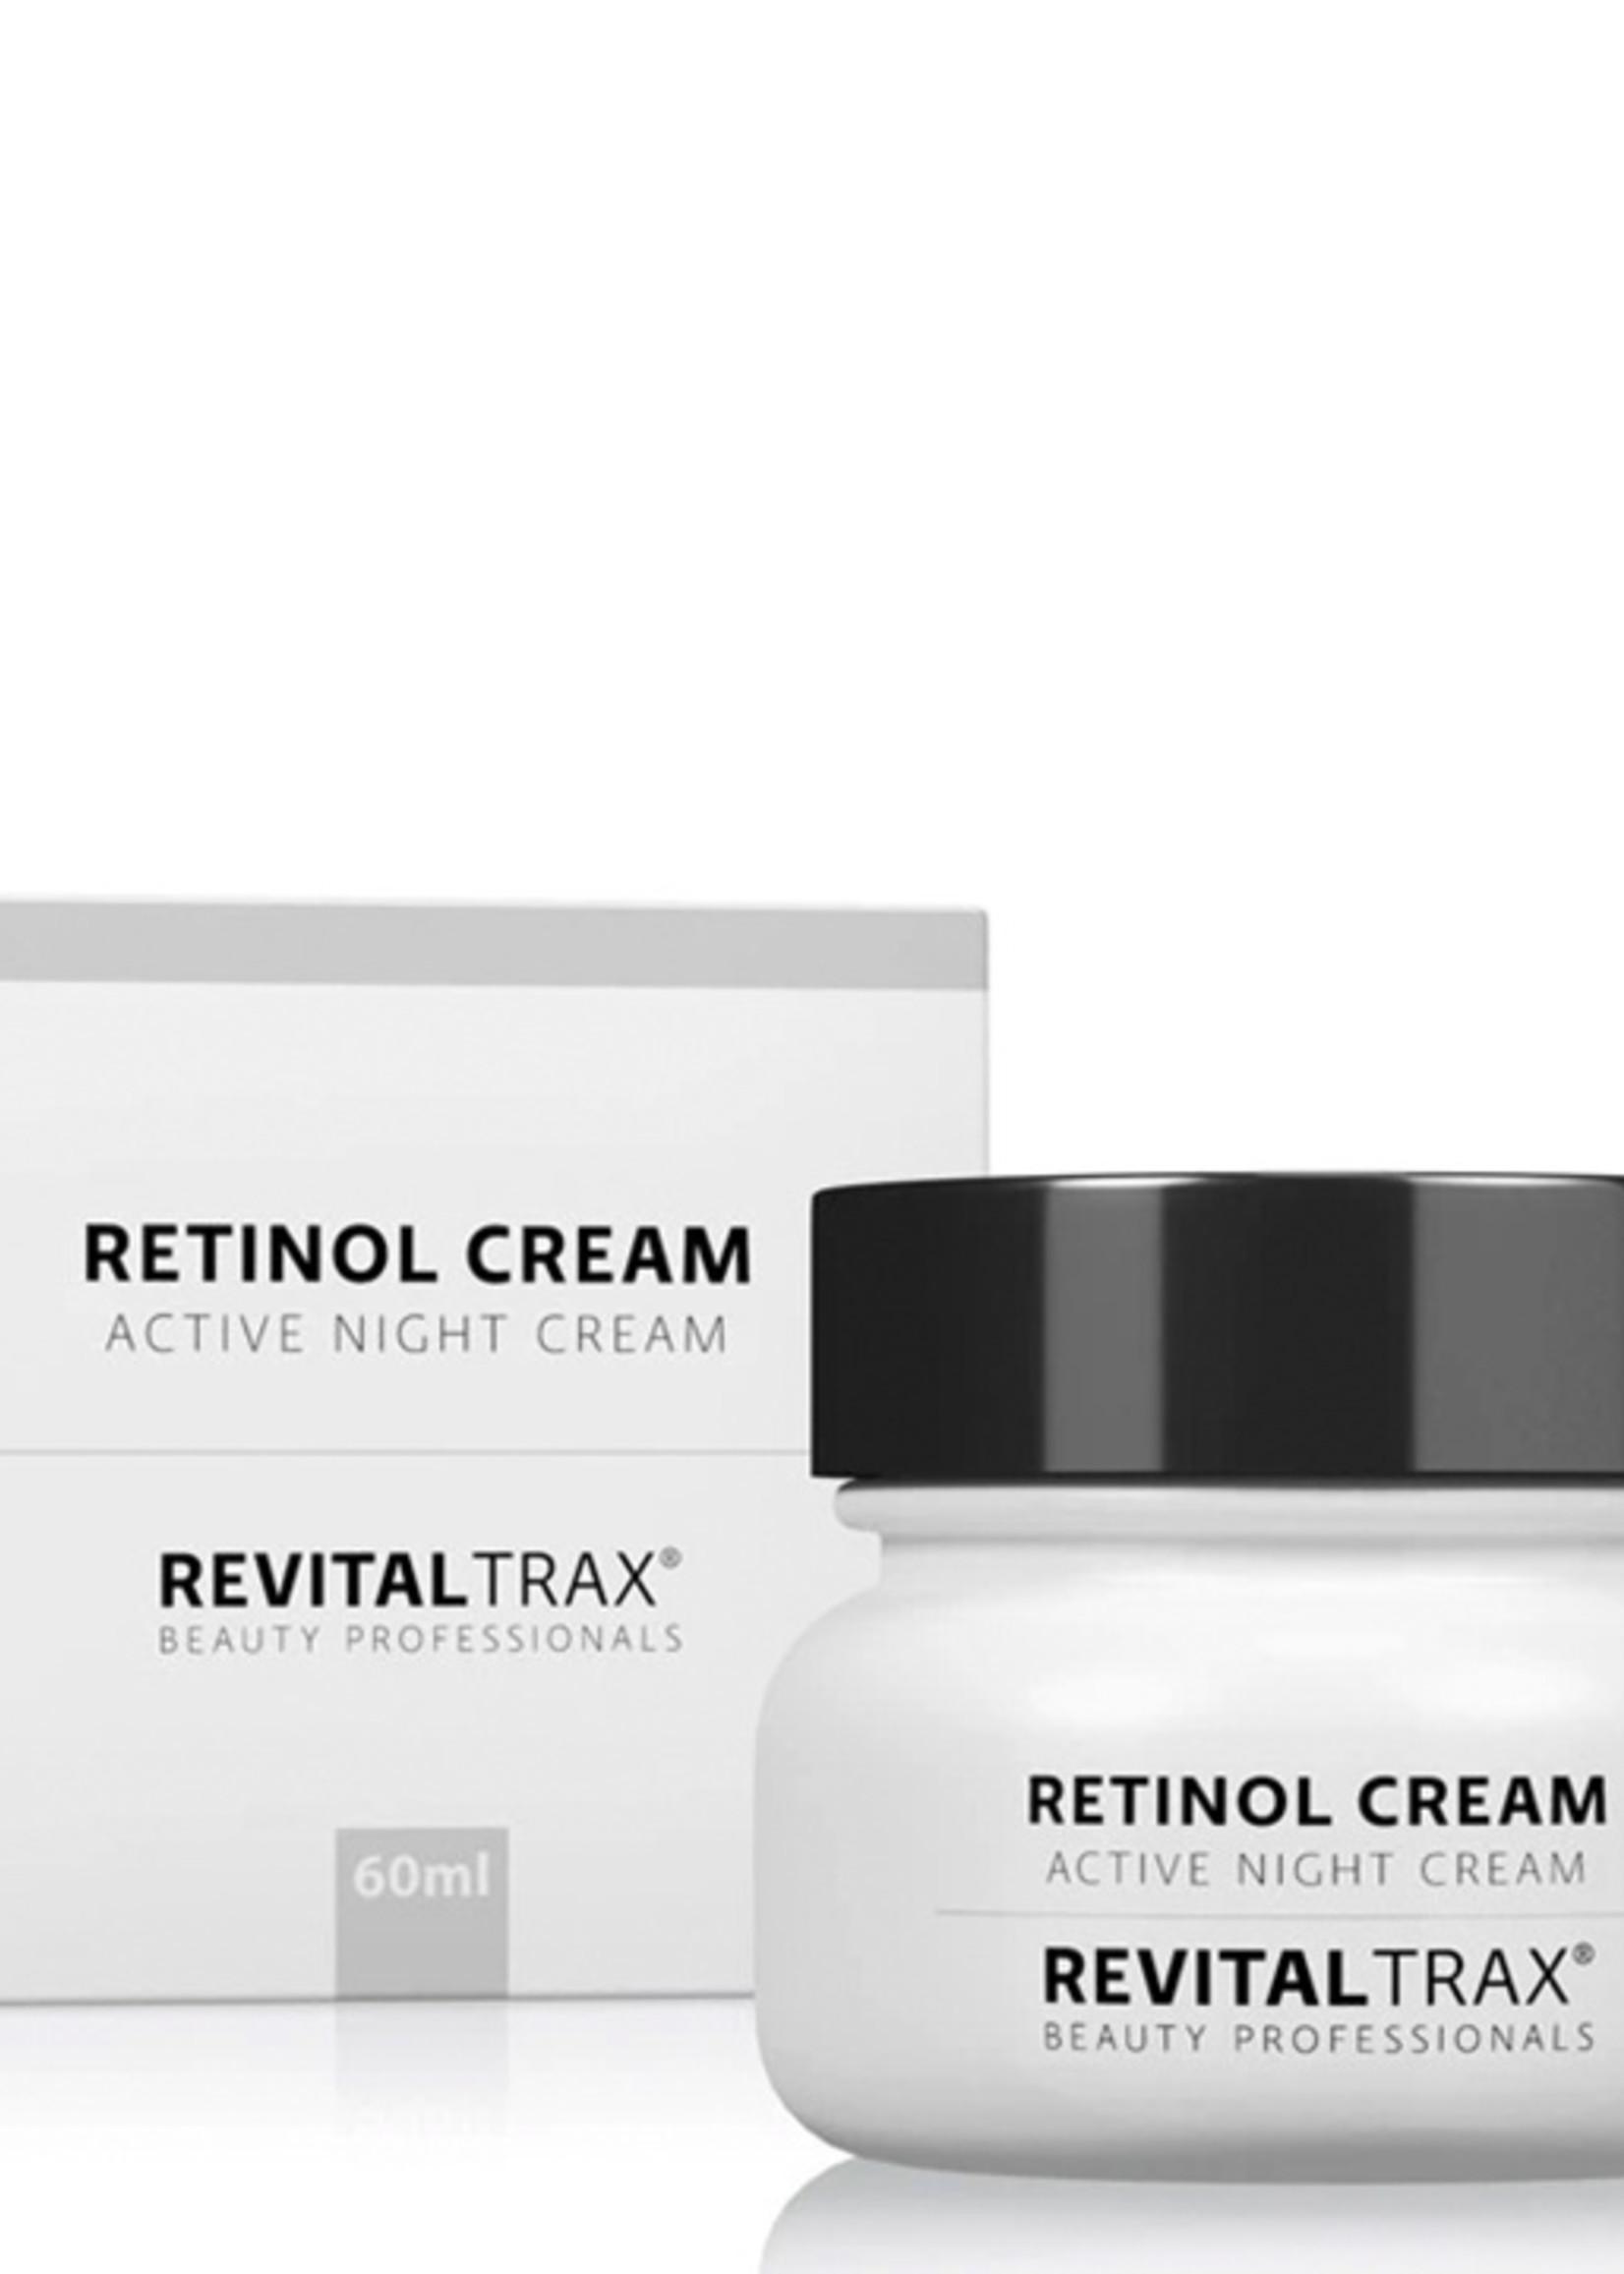 Revitaltrax Active Night Cream